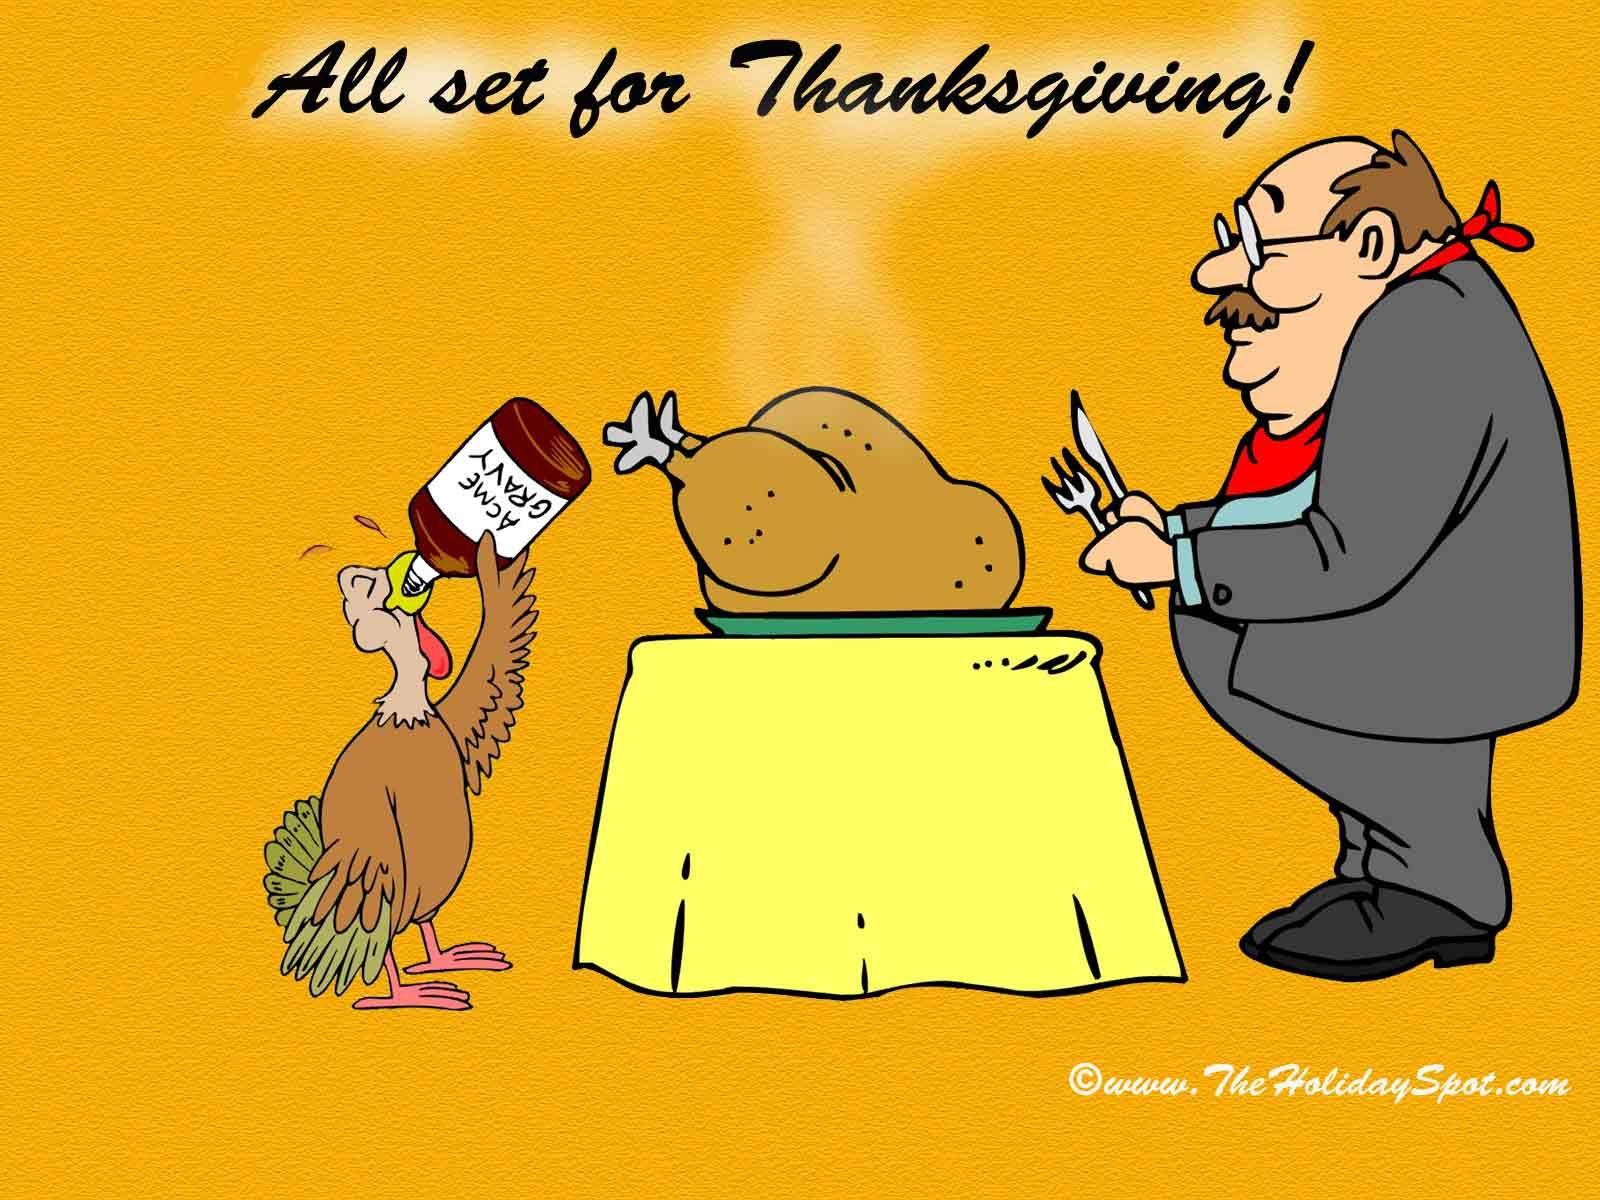 Funny Thanksgiving Photos Just Fun Funny Thanksgiving Images Happy Thanksgiving Images Thanksgiving Jokes